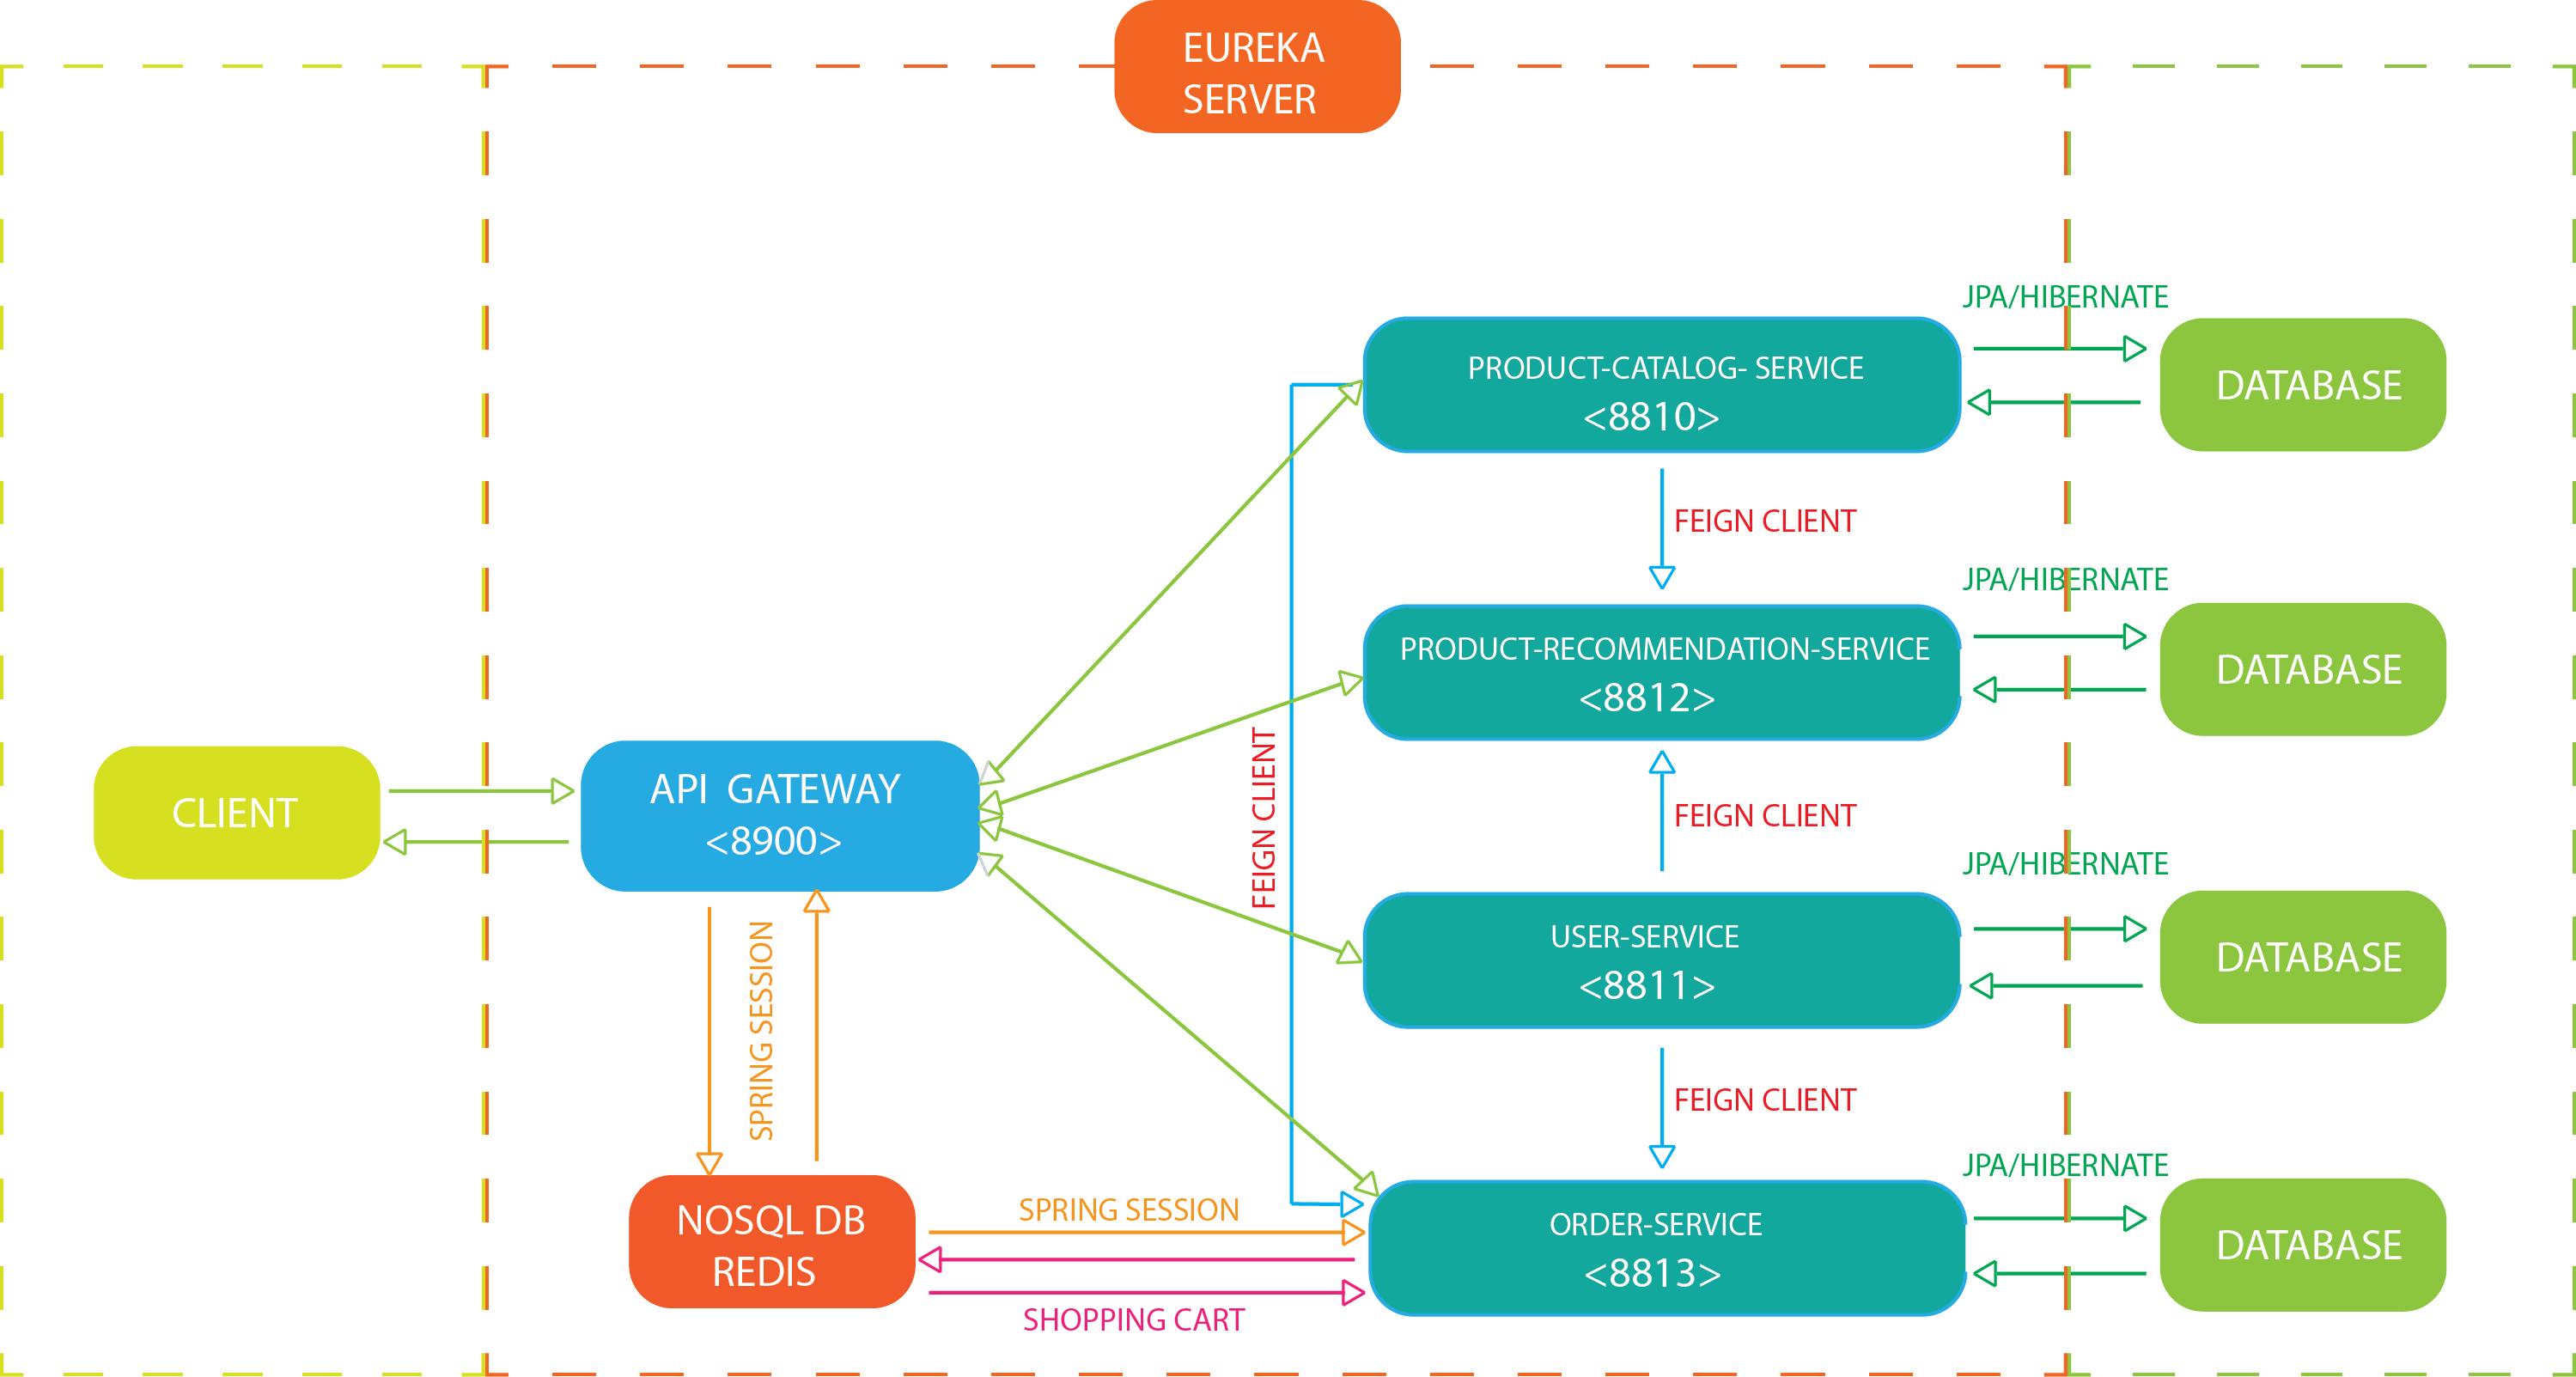 REST Microservices architecture for E